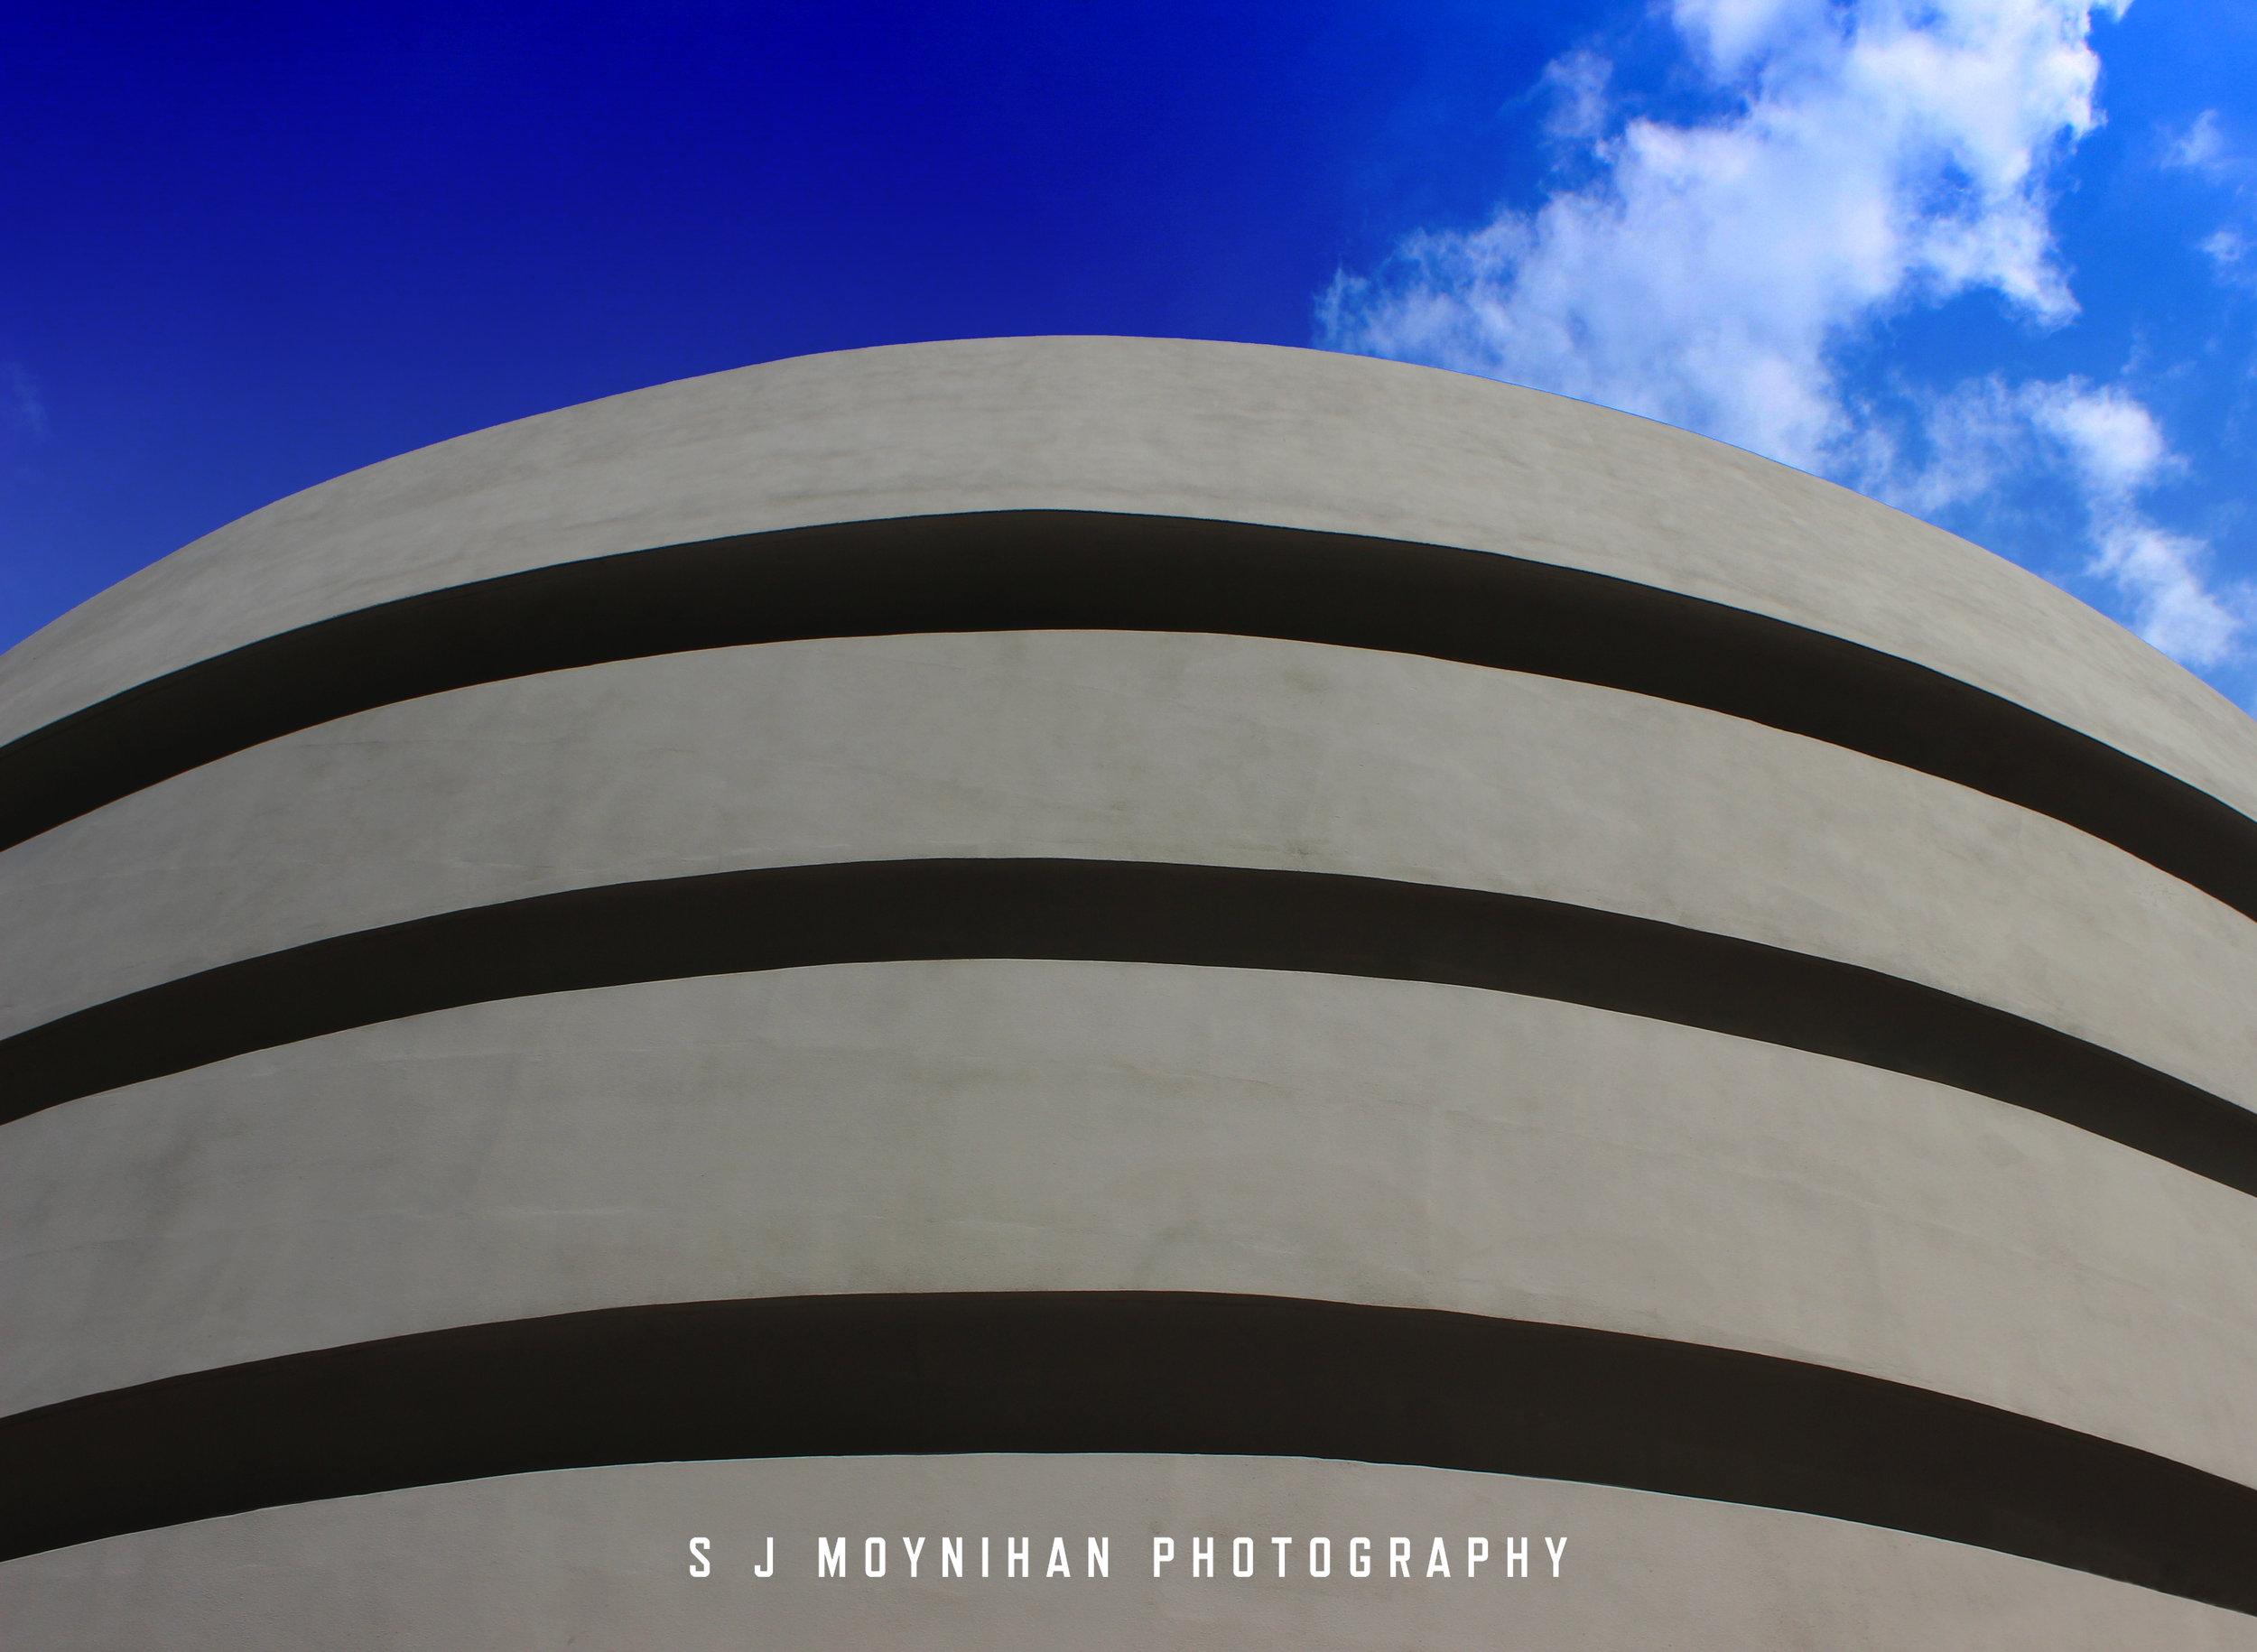 Guggenheim-1.jpg